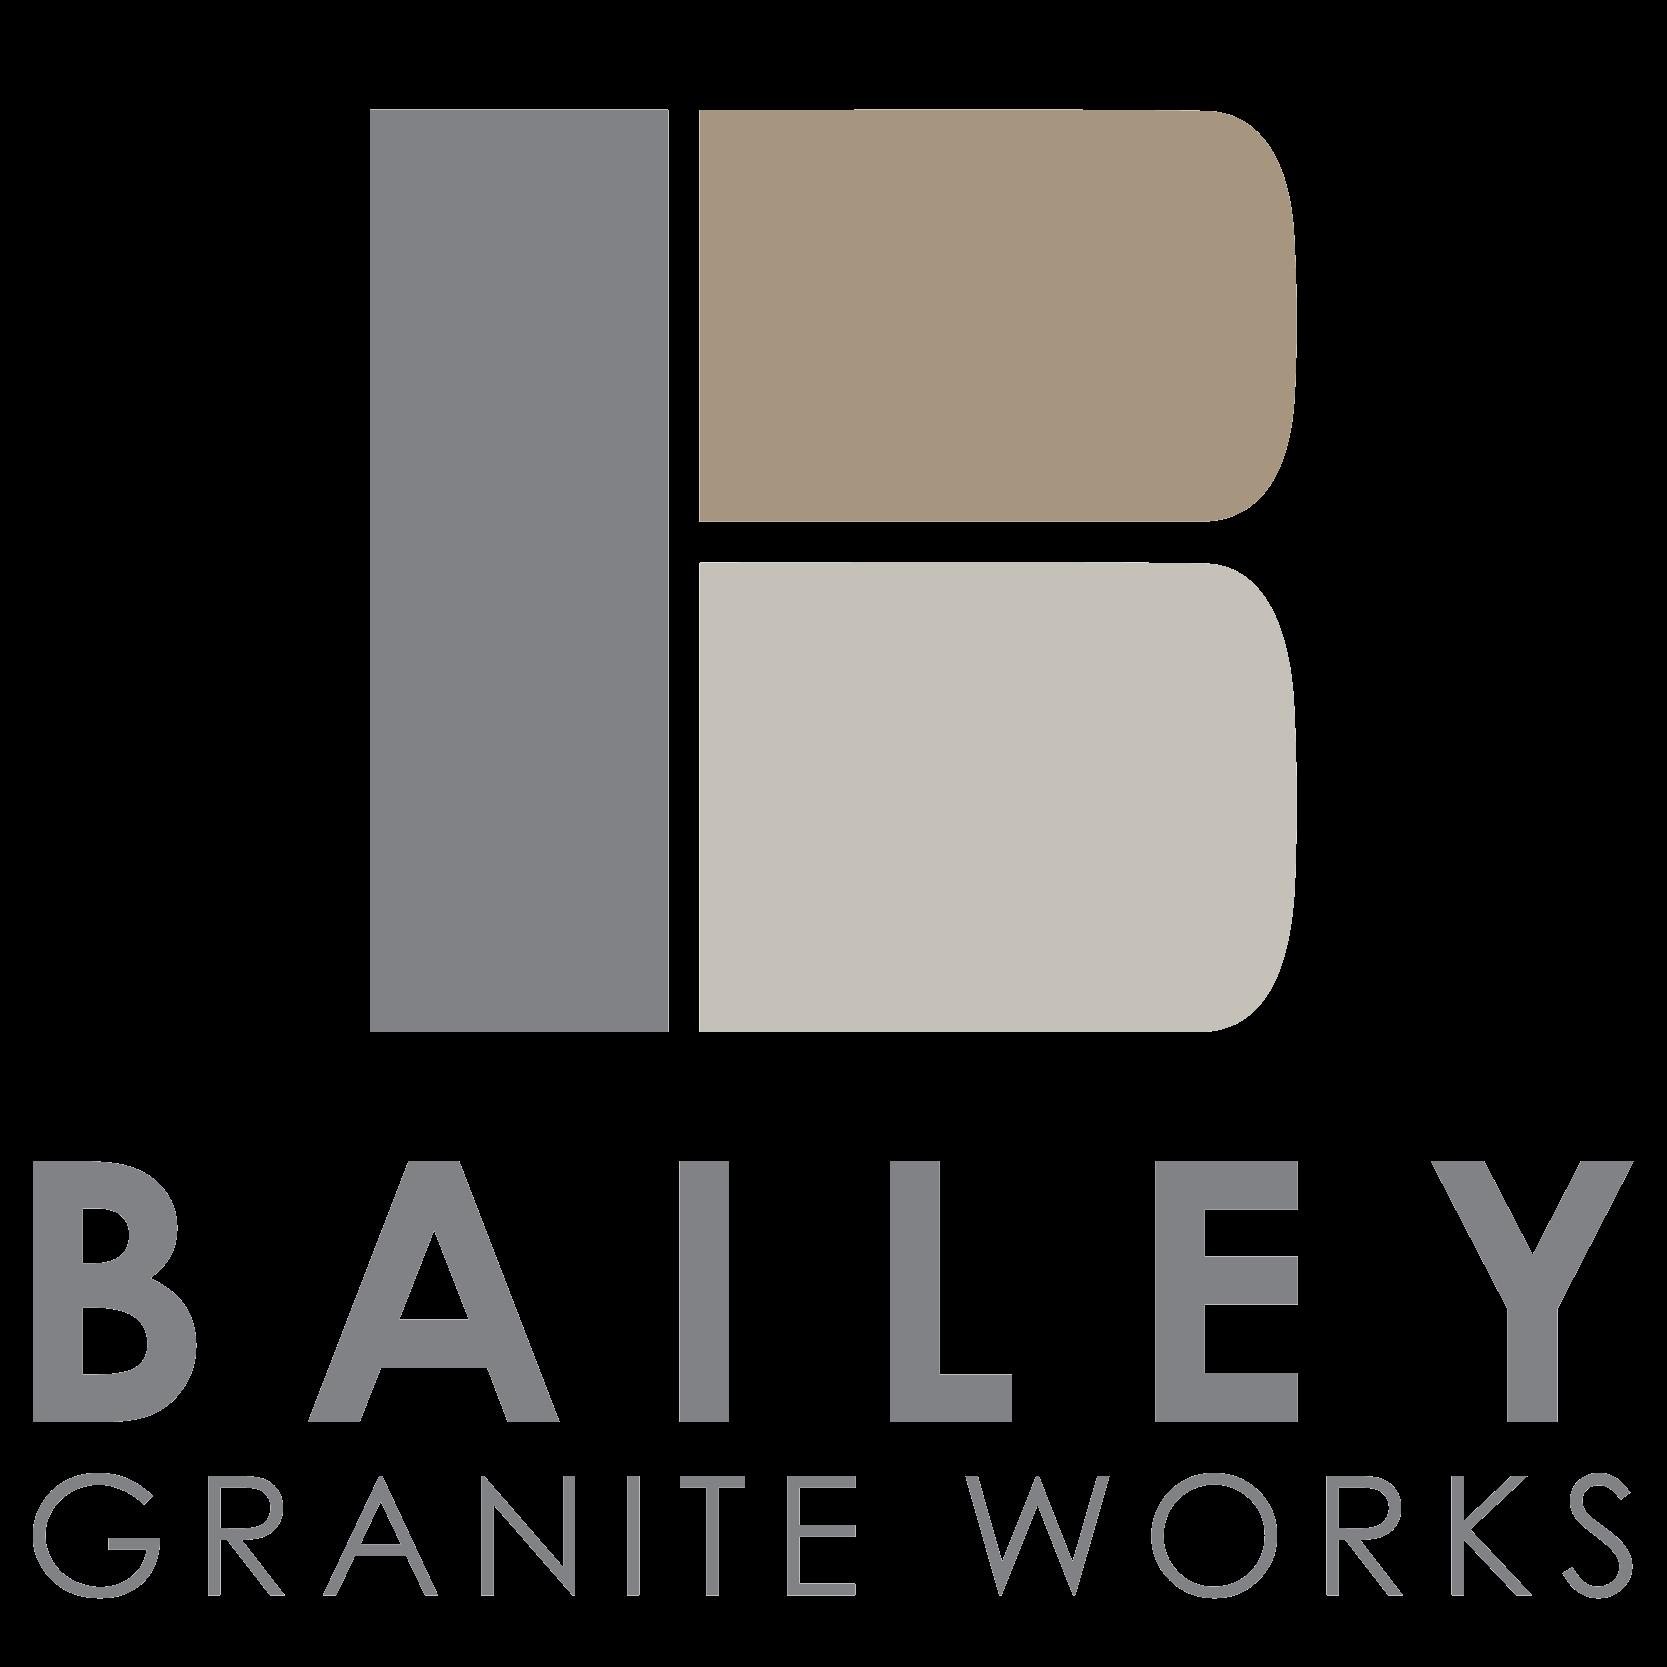 Bailey Granite Works is a Granite Company in Chico, CA